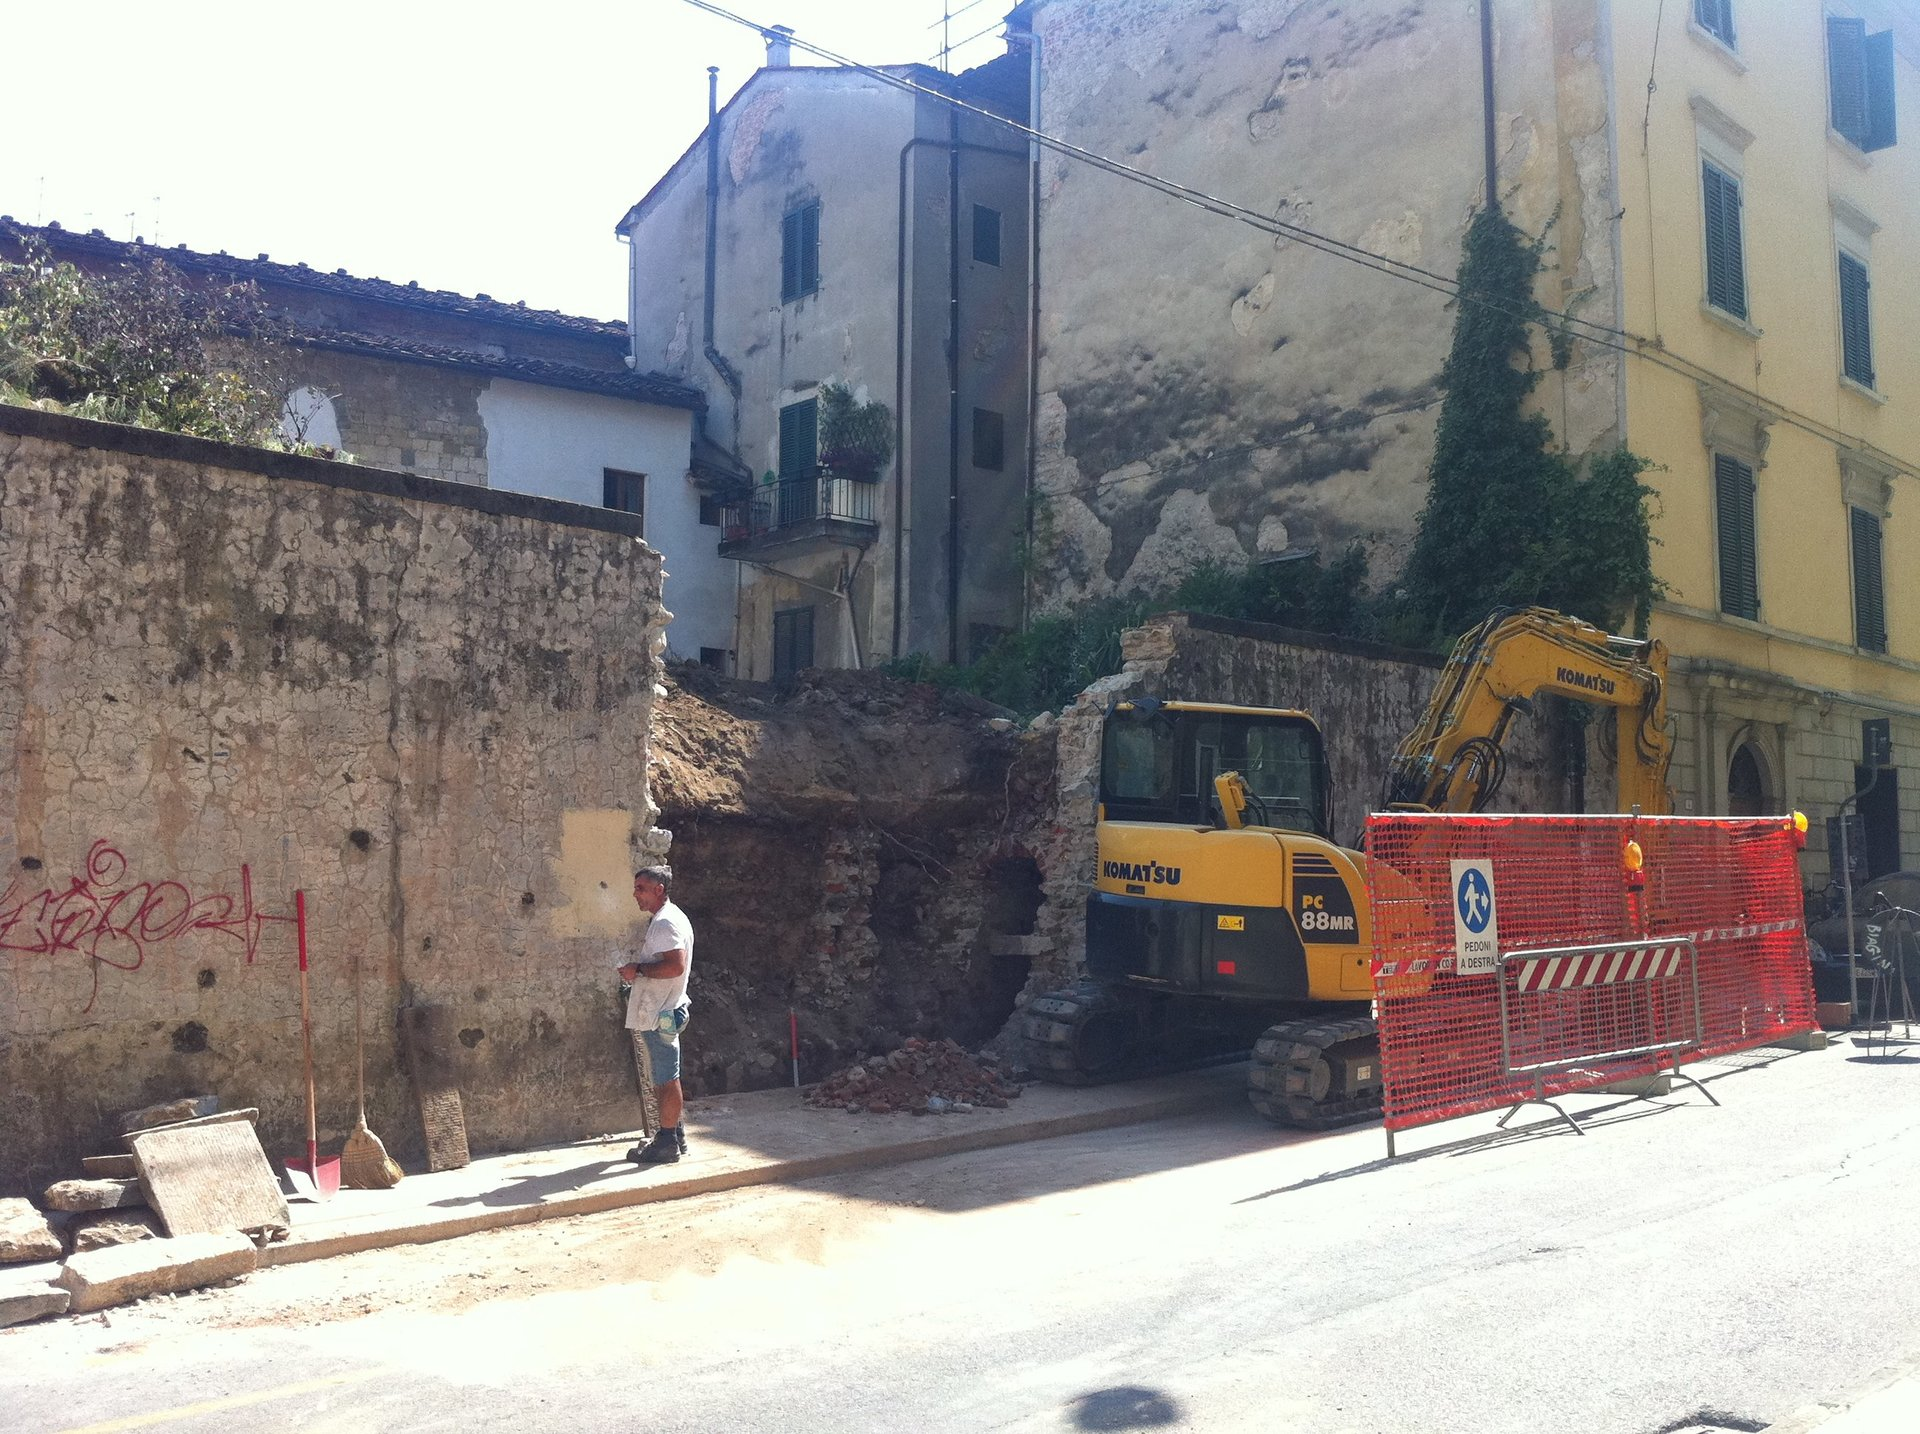 una casa demolita e accanto una demolitrice